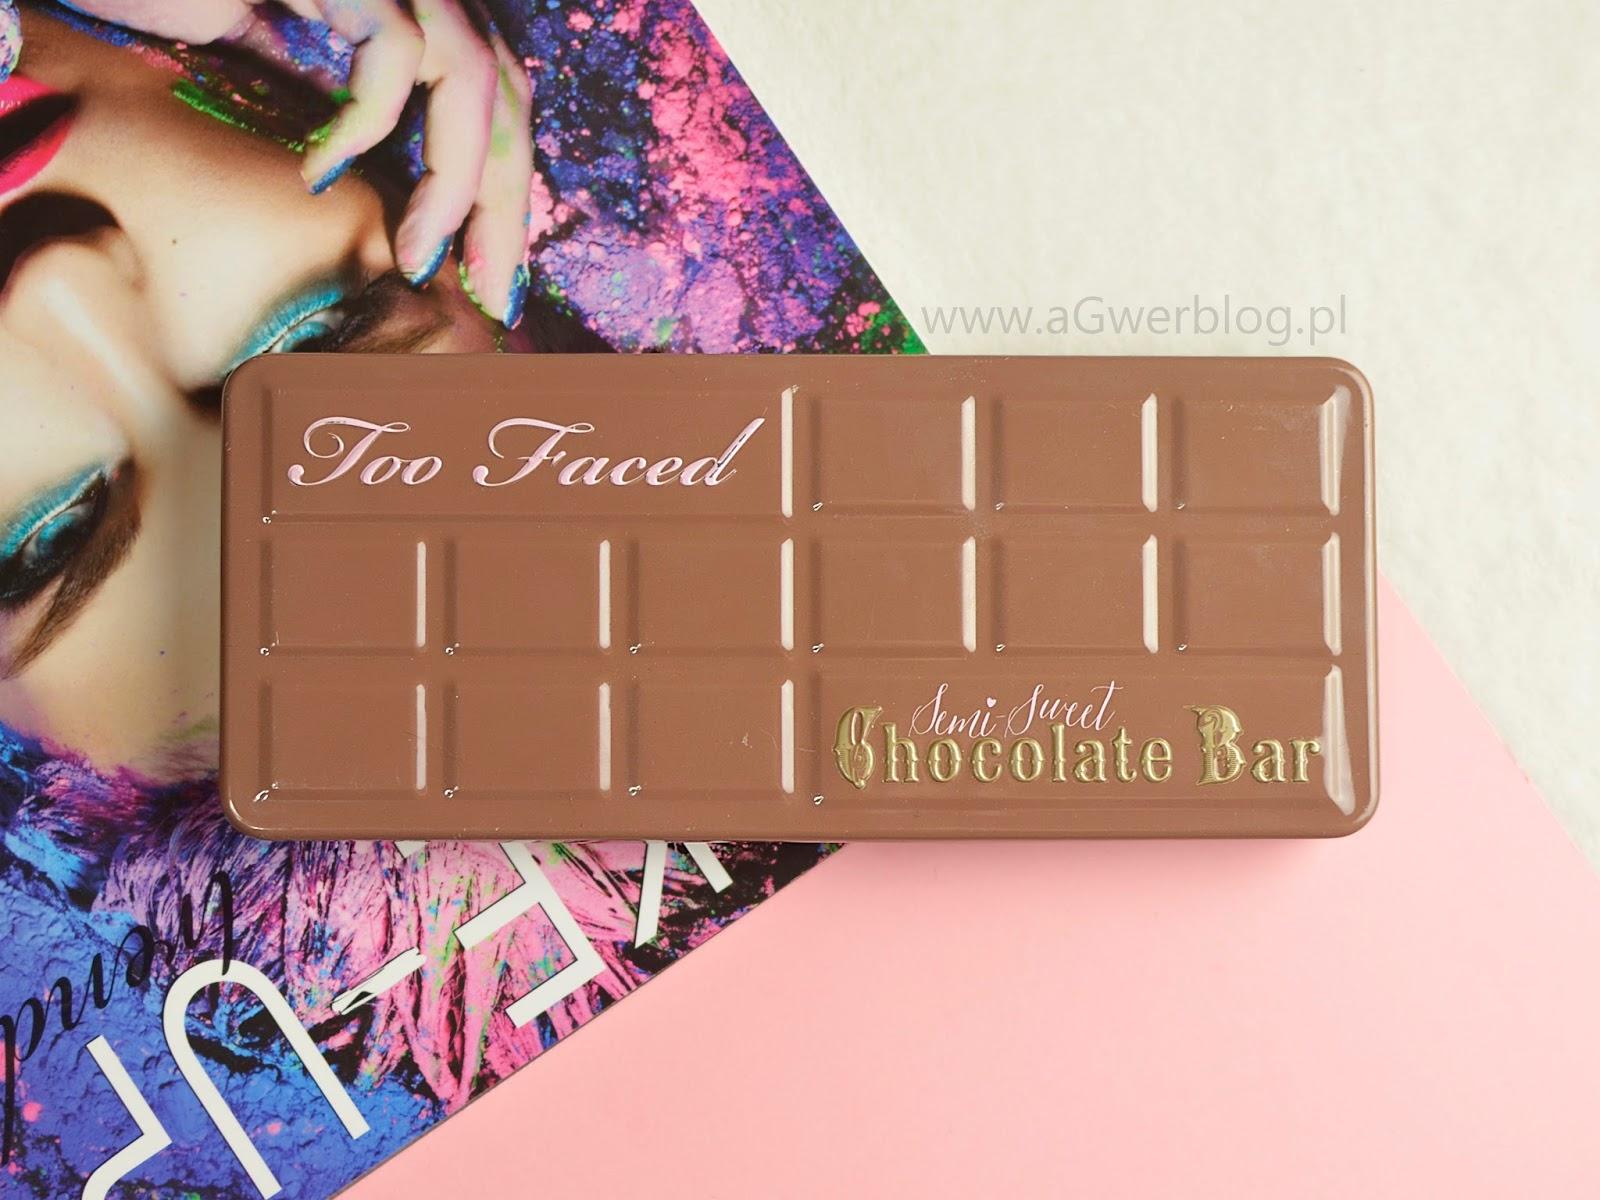 Too Faced Chocolate Bar Semi Sweet